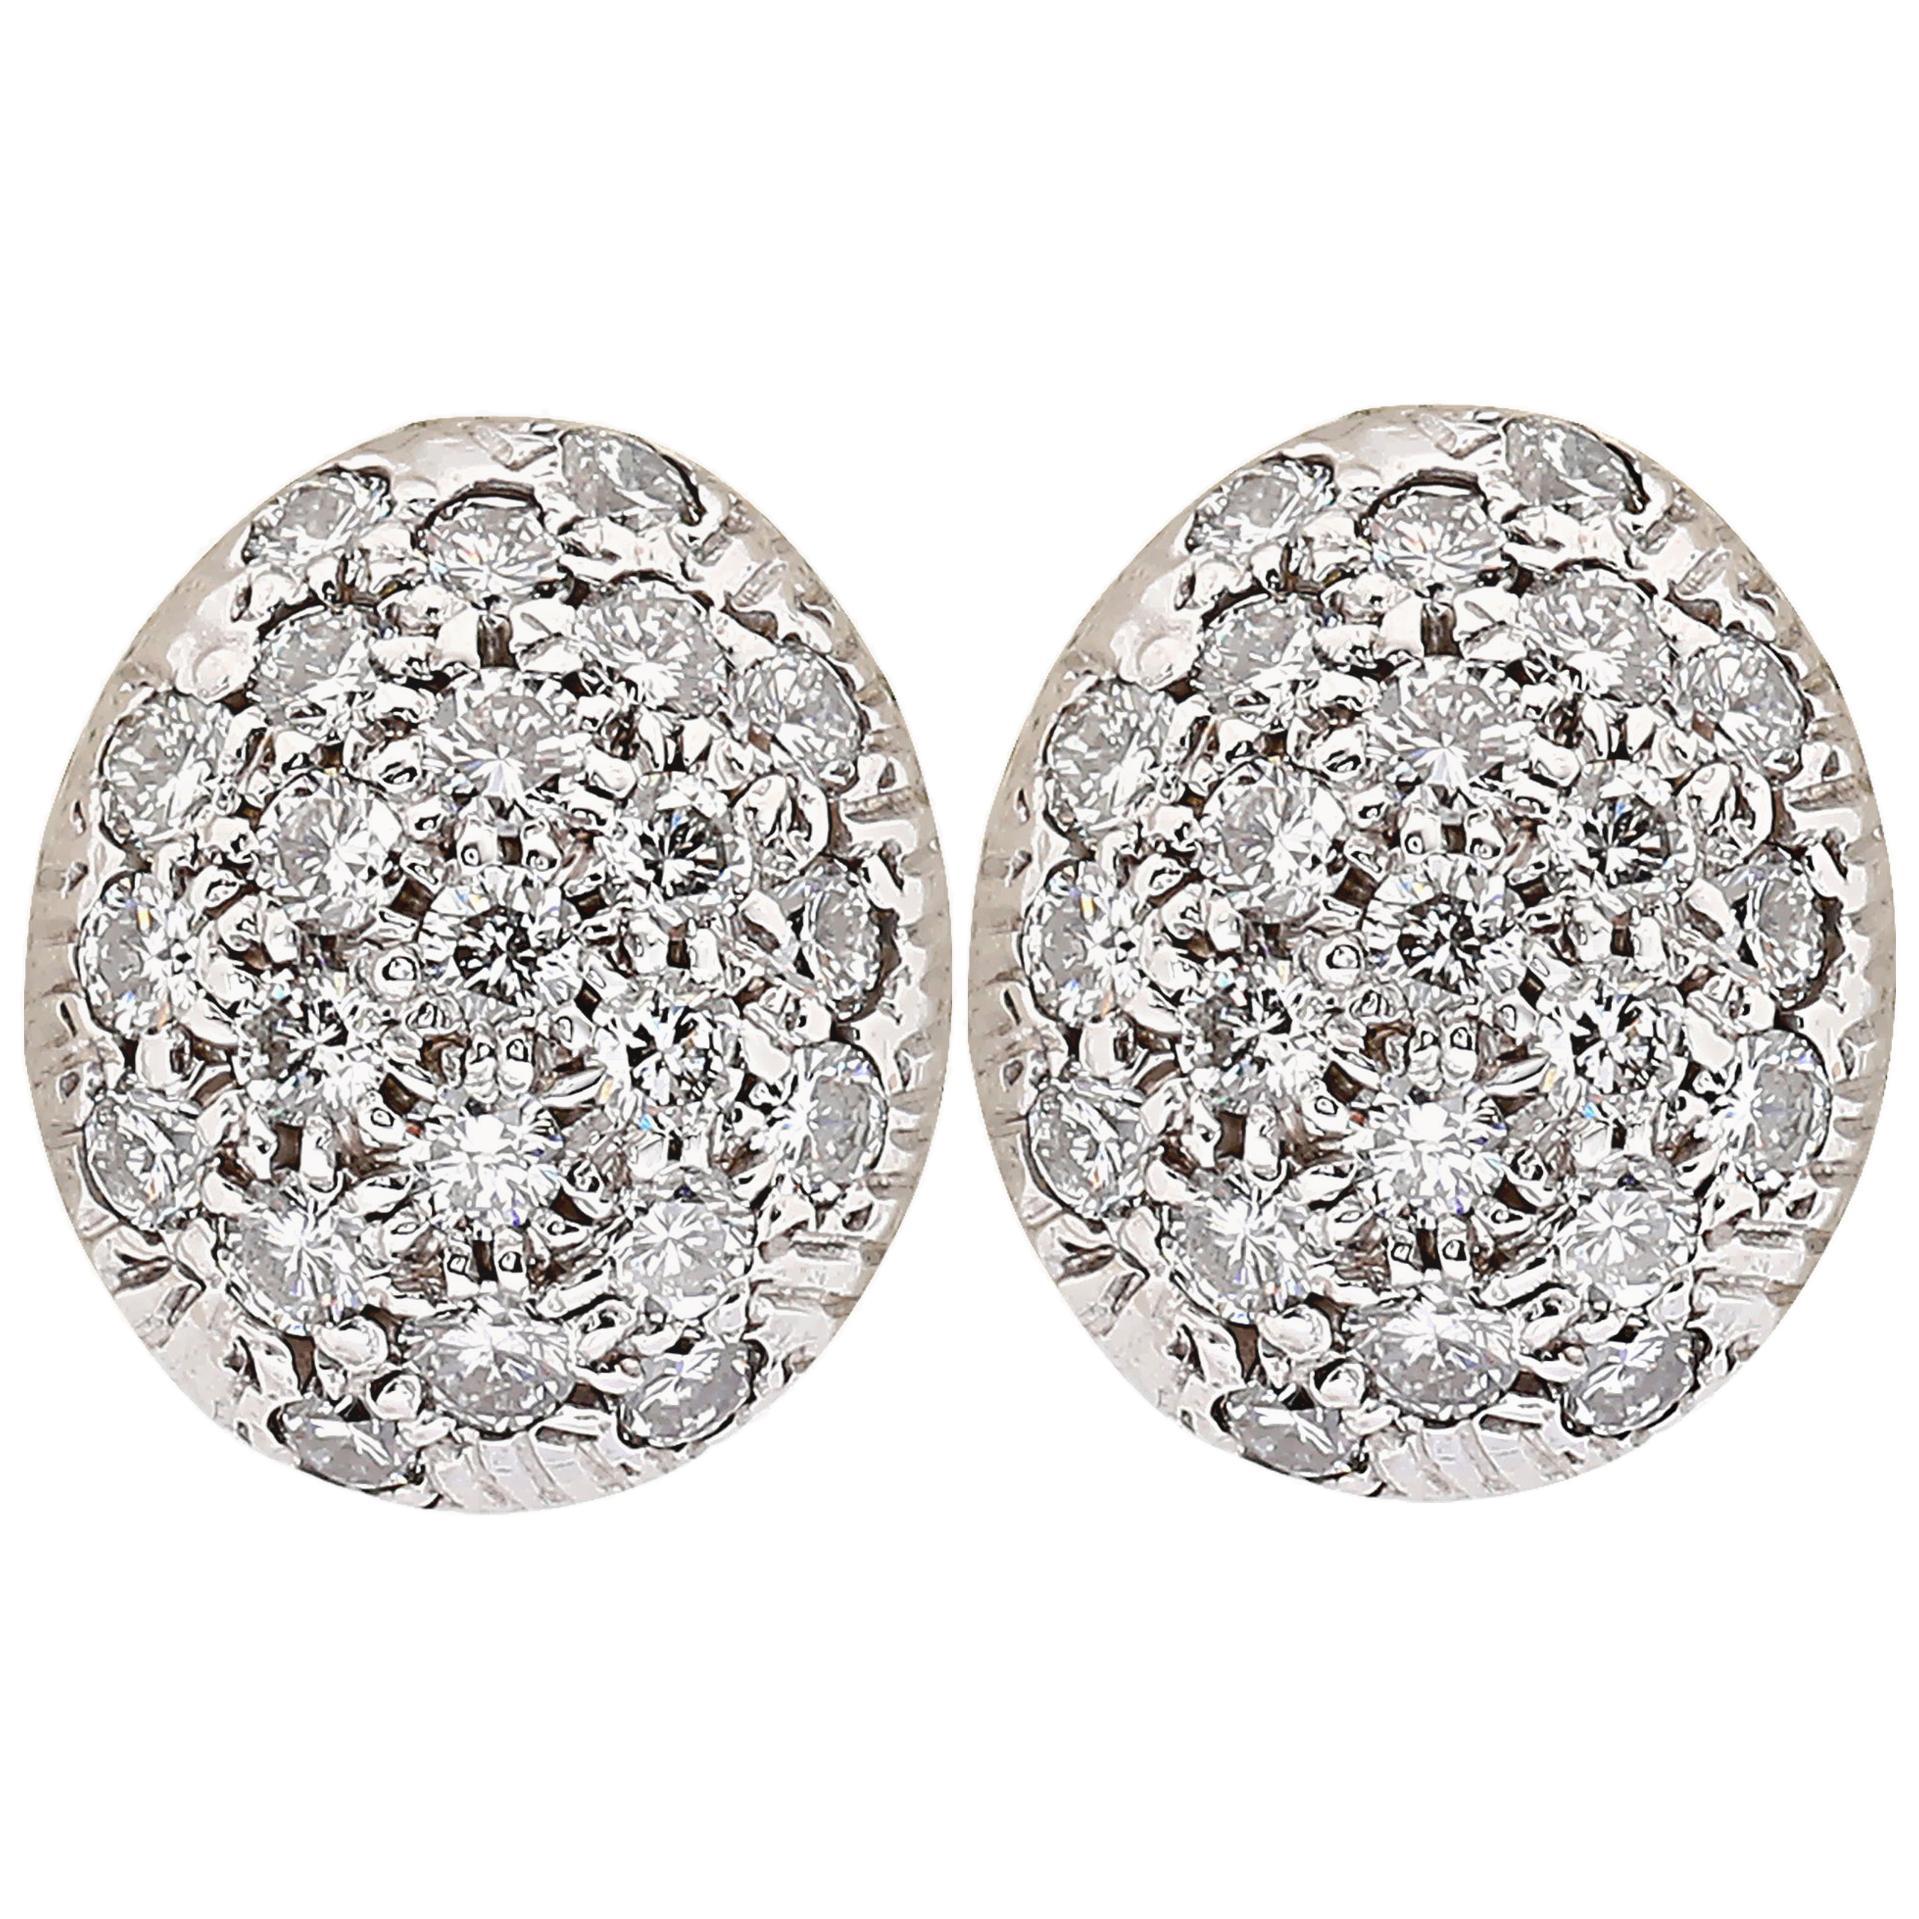 Vintage Dome Diamond Cluster Earrings